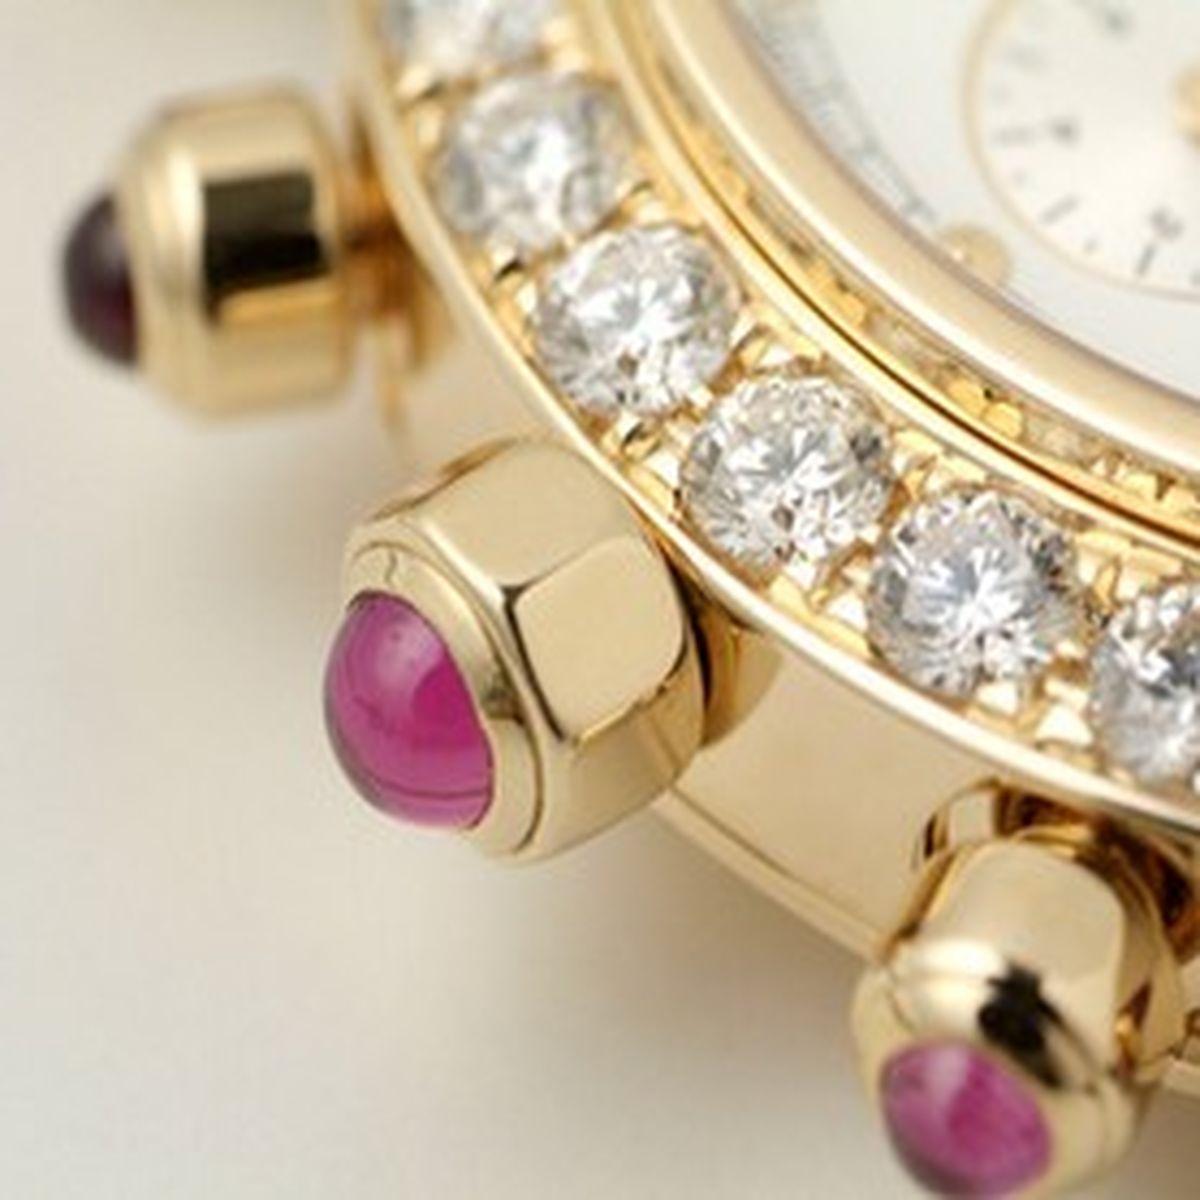 Jewelry Watch Repair in Brookline, MA  Village Watch Center